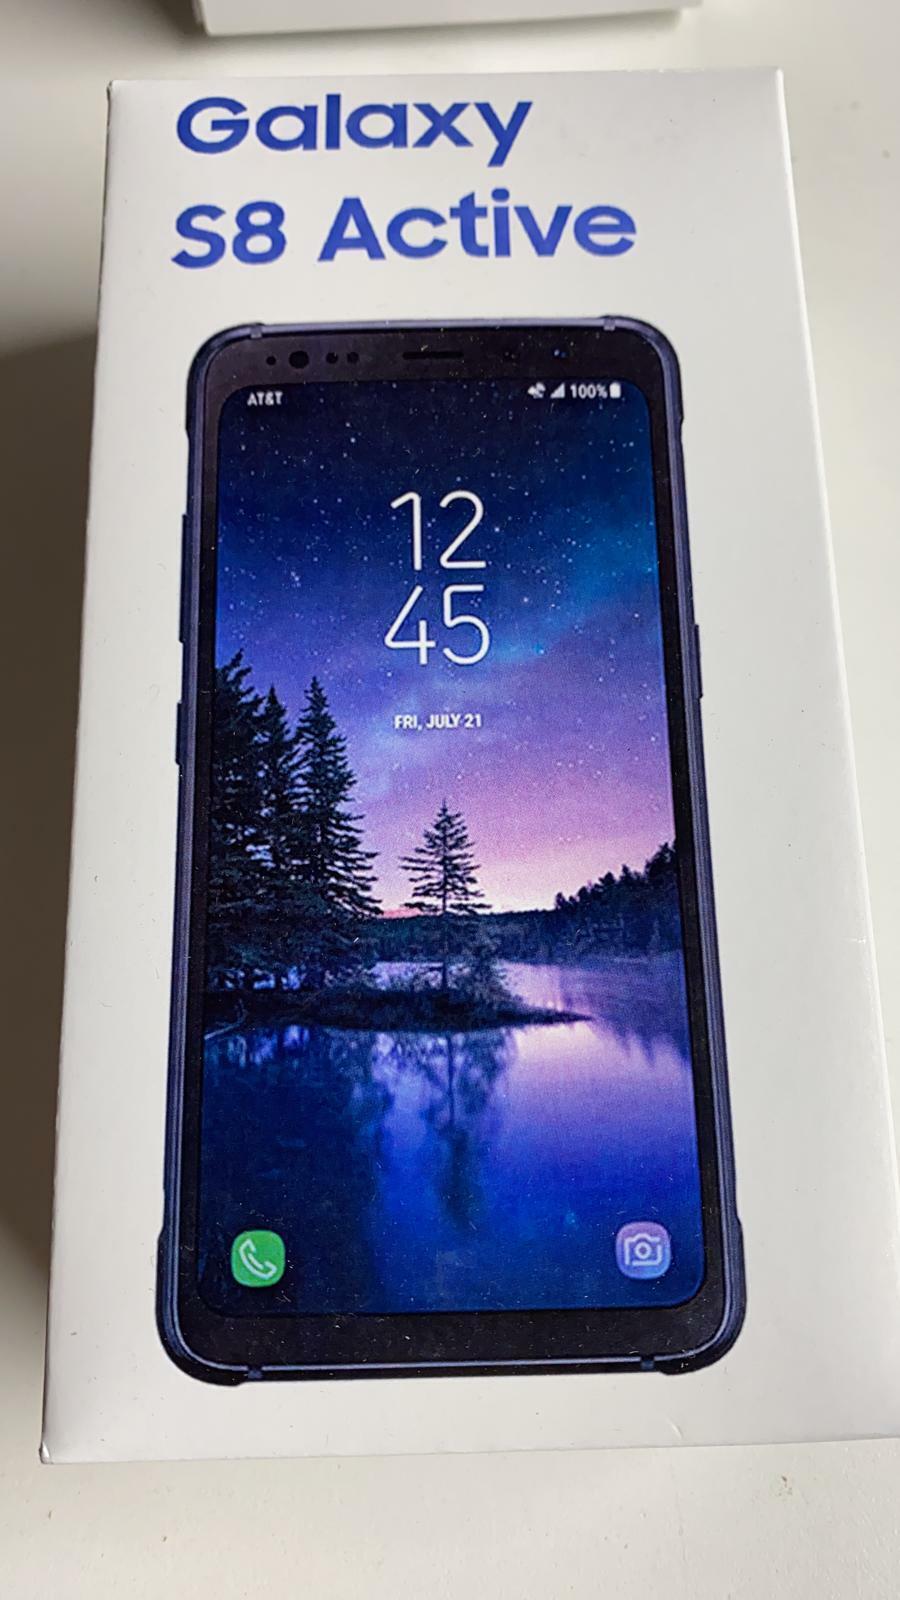 Unlocked Samsung Galaxy S8 Active SM-G892A - 64GB - Meteor Gray AT&T Phone